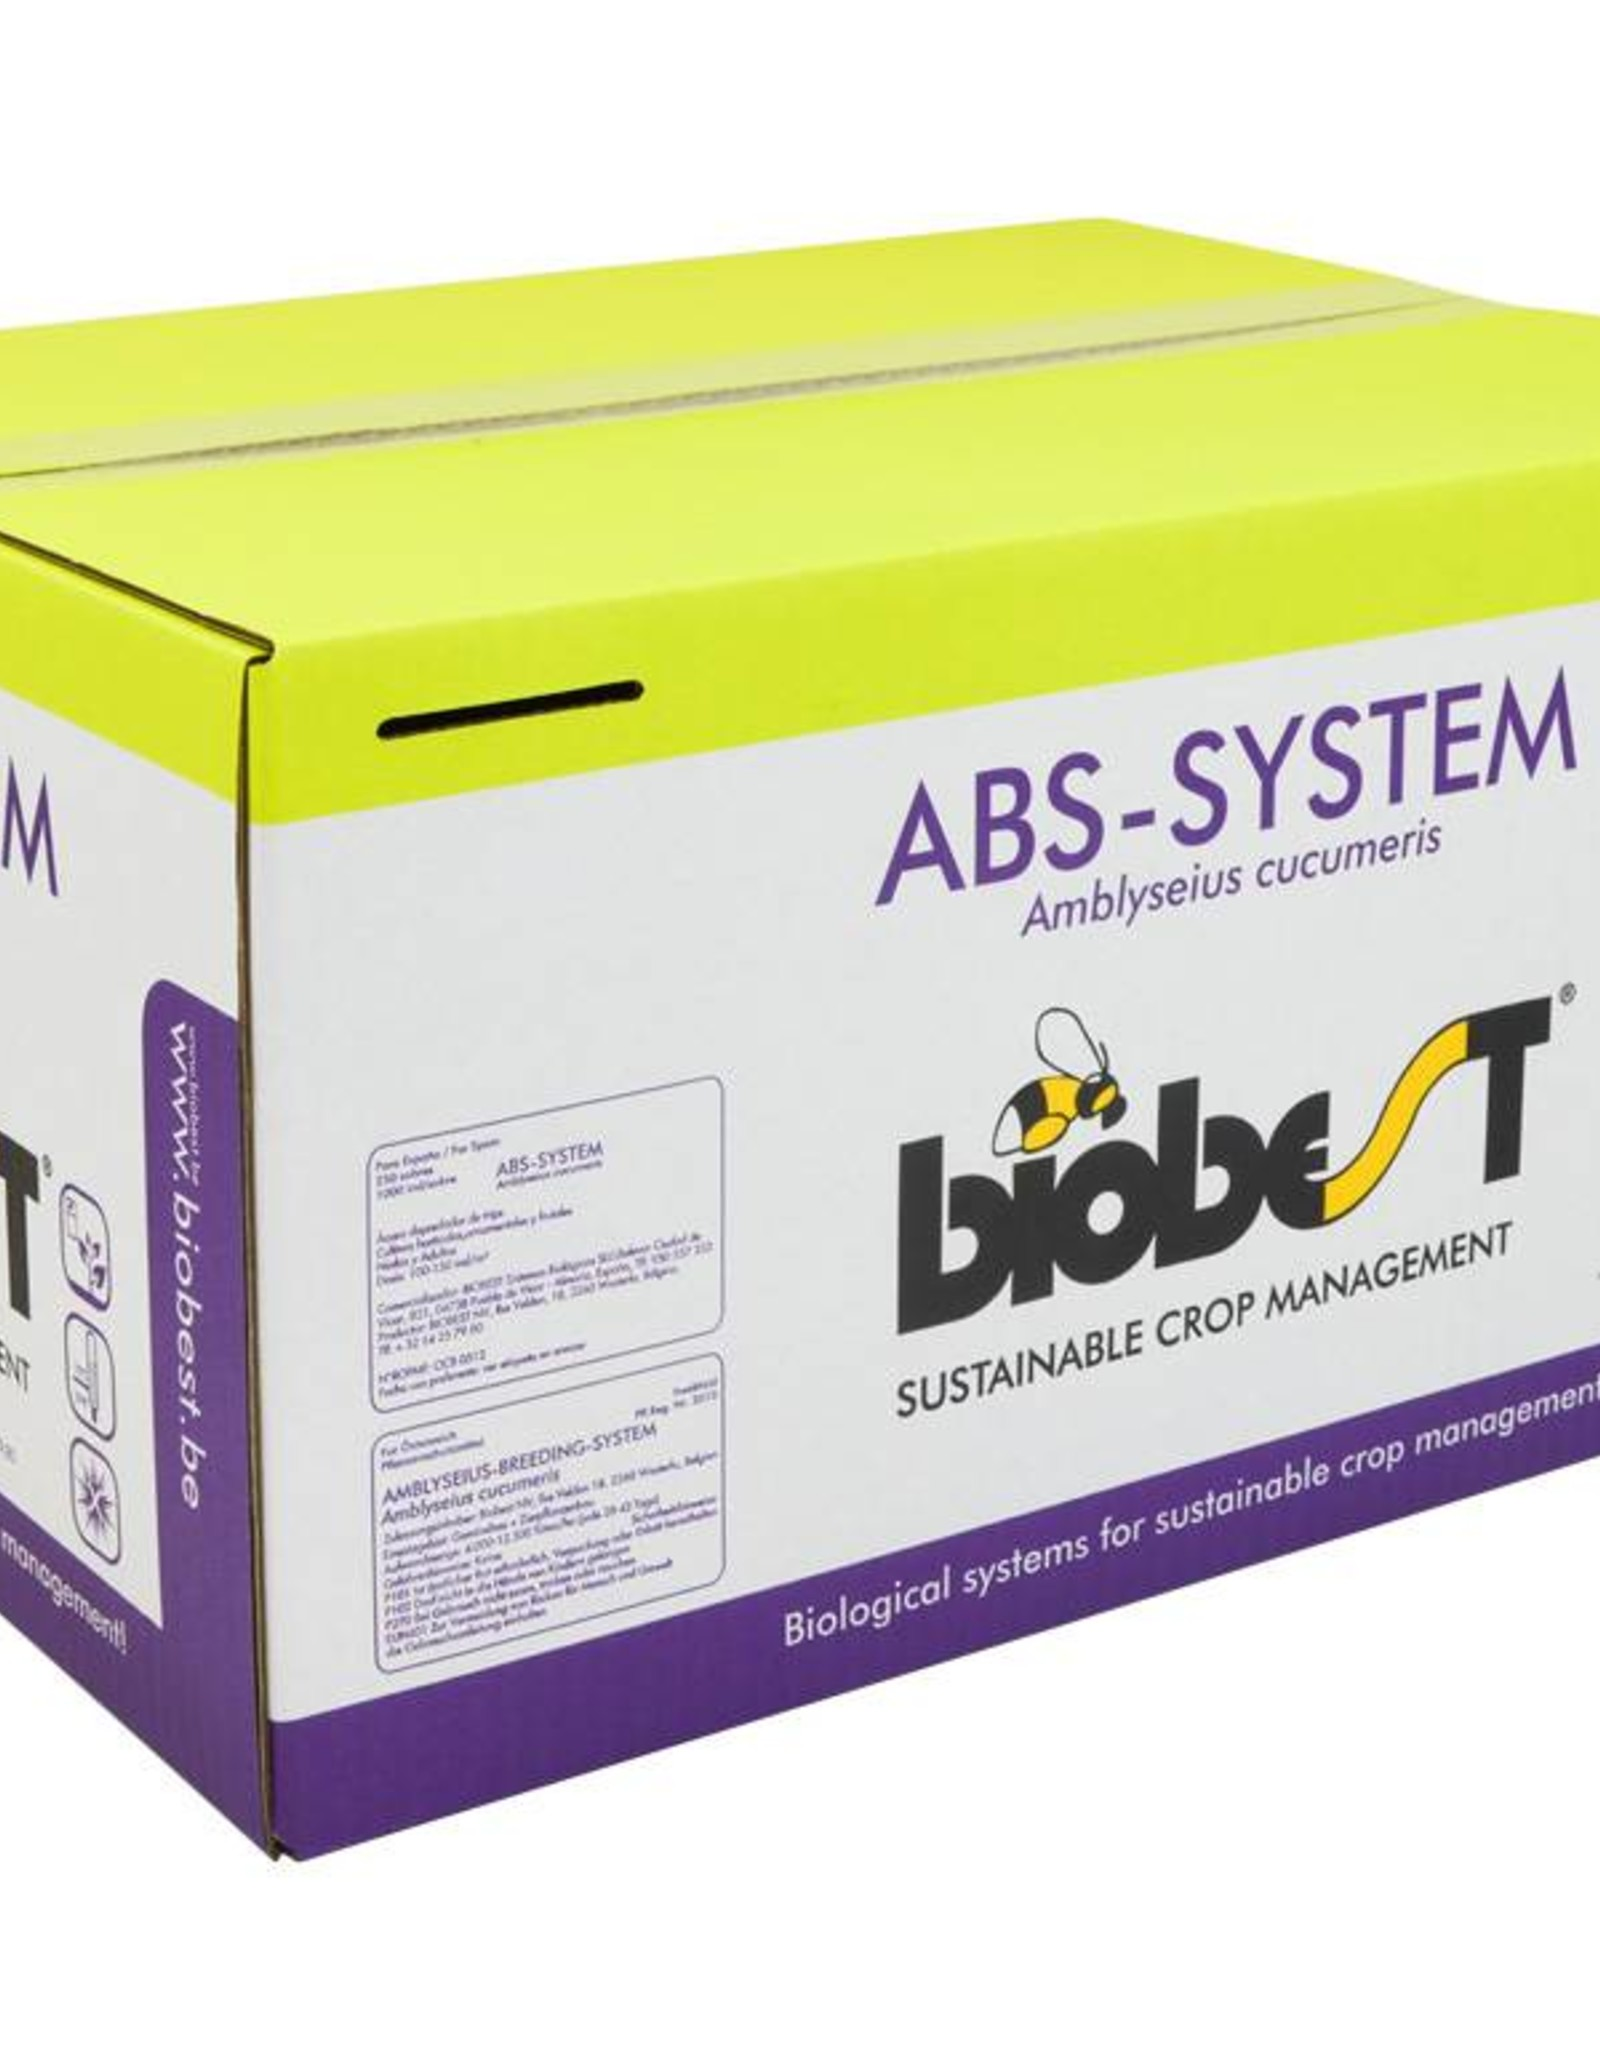 Brimex Biobest Roofmijt Brimex ABS System Amblyseius cucumeris